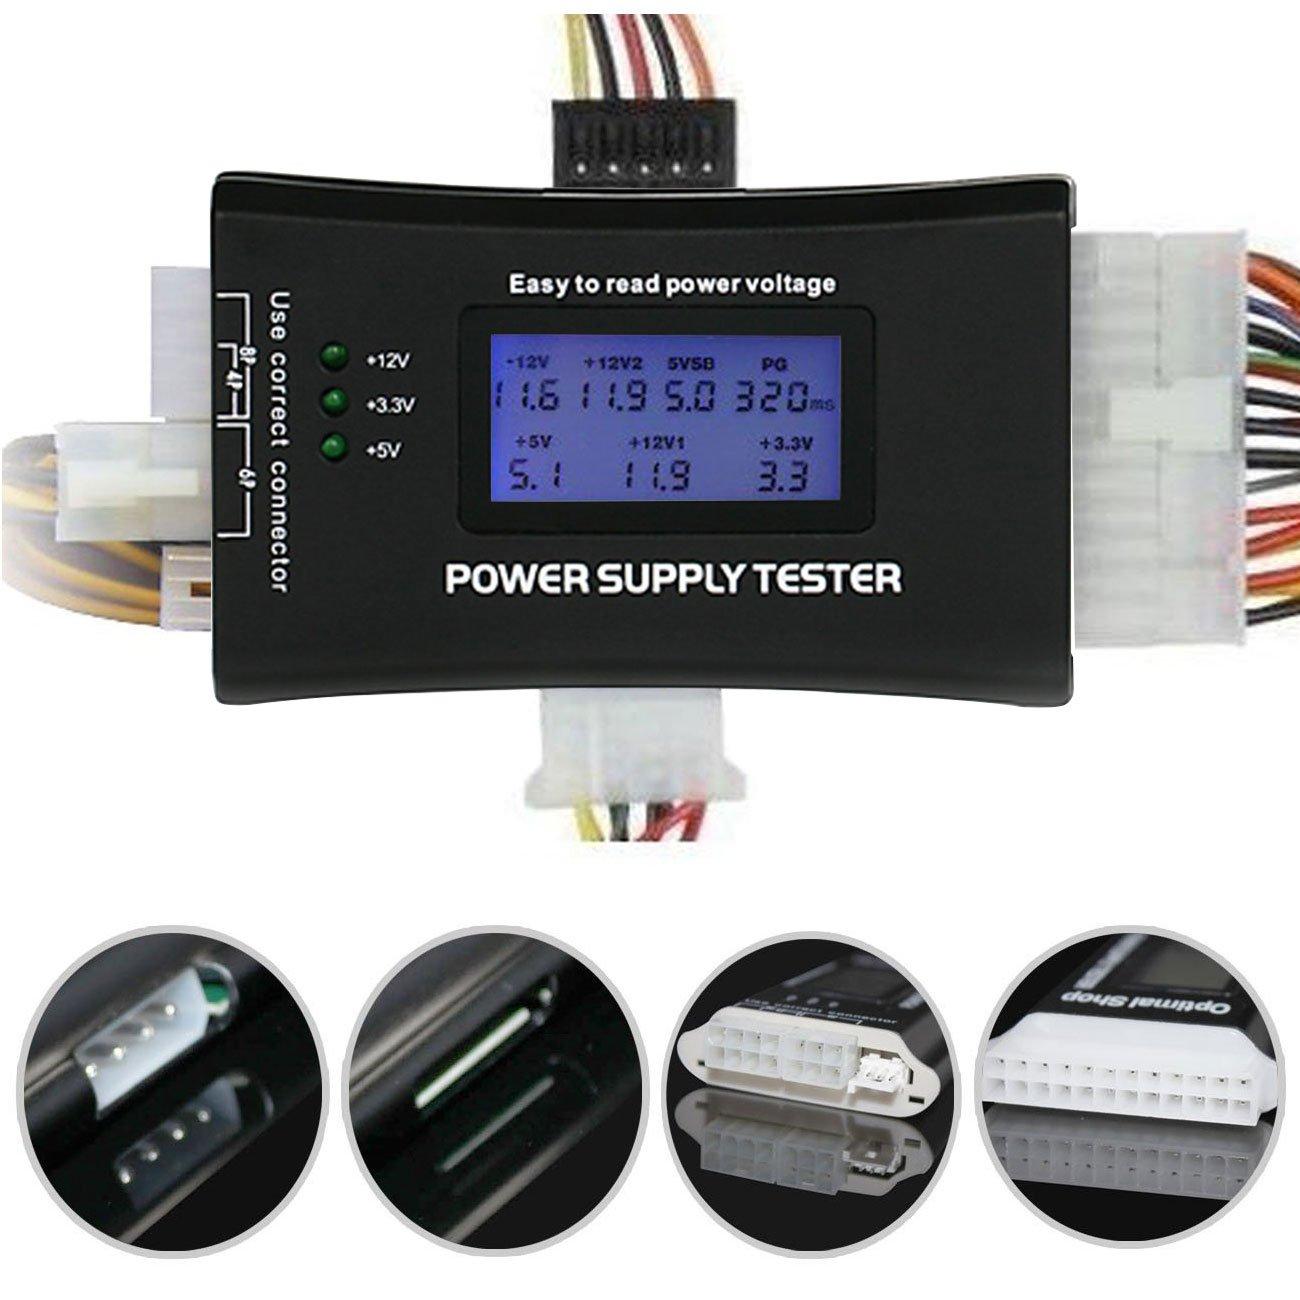 EEEKit Power Supply Tester PC Computer 20/24 Pin ATX BTX ITX PSU SATA HDD Connectors Avoid Computer Equipment Damage Indicate Status Voltage